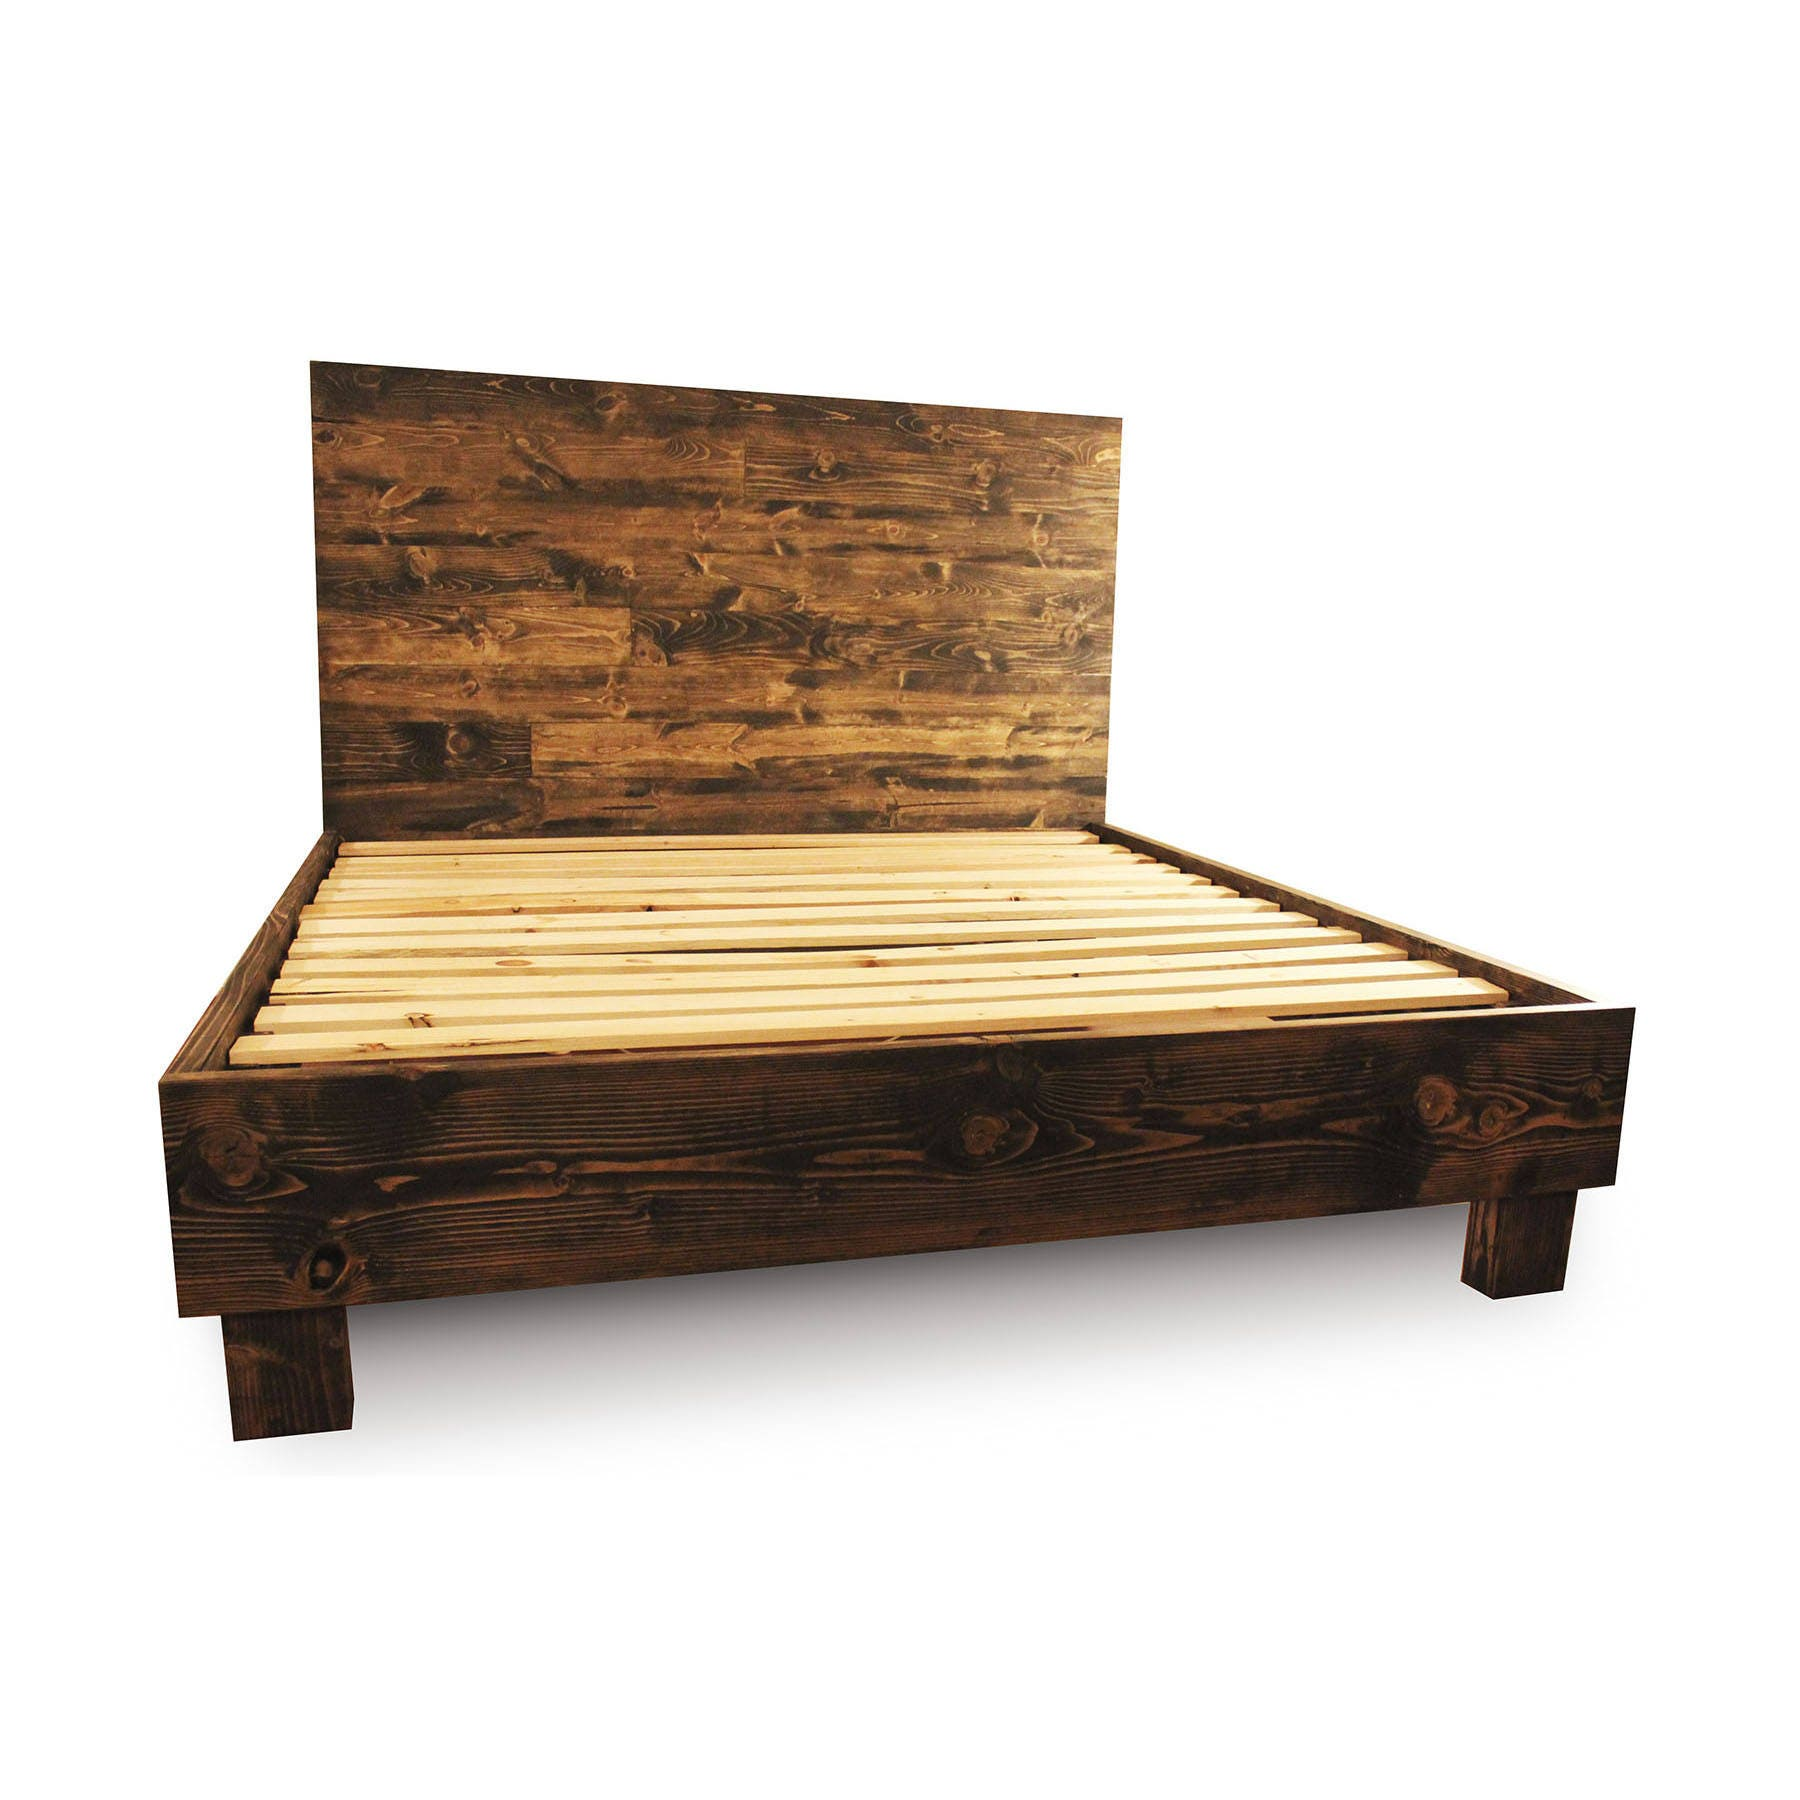 Recycled wood bed frames - Rustic Solid Wood Platform Bed Frame Headboard Reclaimed Wood Style Bedroom Furniture Reclaimed